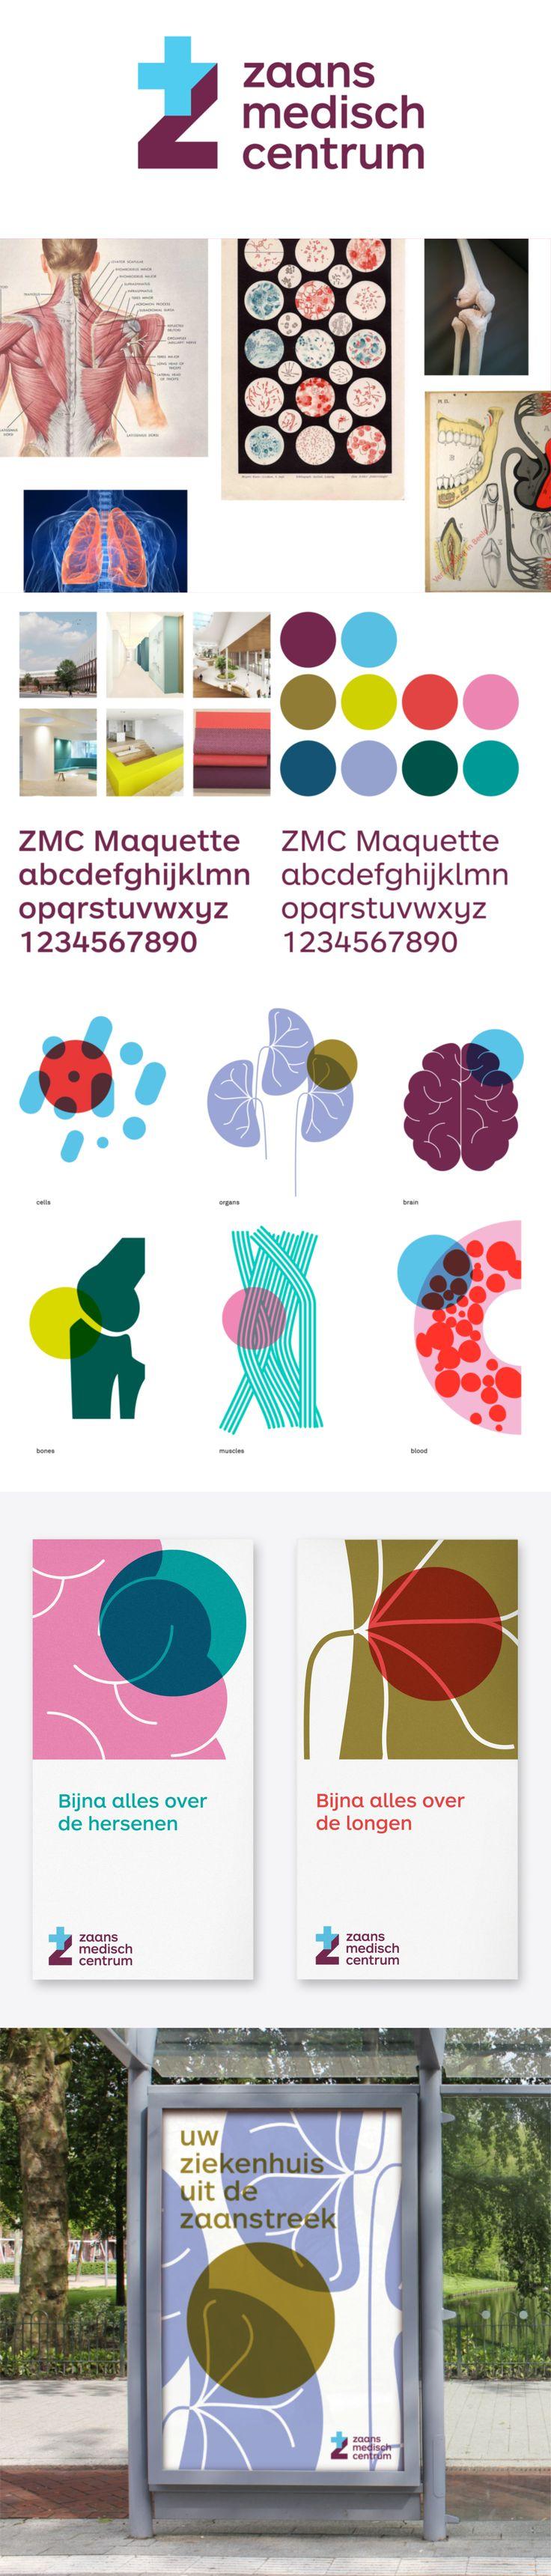 More corporate-designs are collected on: https://pinterest.com/rothenhaeusler/best-of-corporate-design/ · Agency: Silo Agency · Client: zaans medisch centrum · Source: http://www.siloagency.com/en/case/brand-identity-for-innovative-hospital/ #branding #identity #corporatedesign